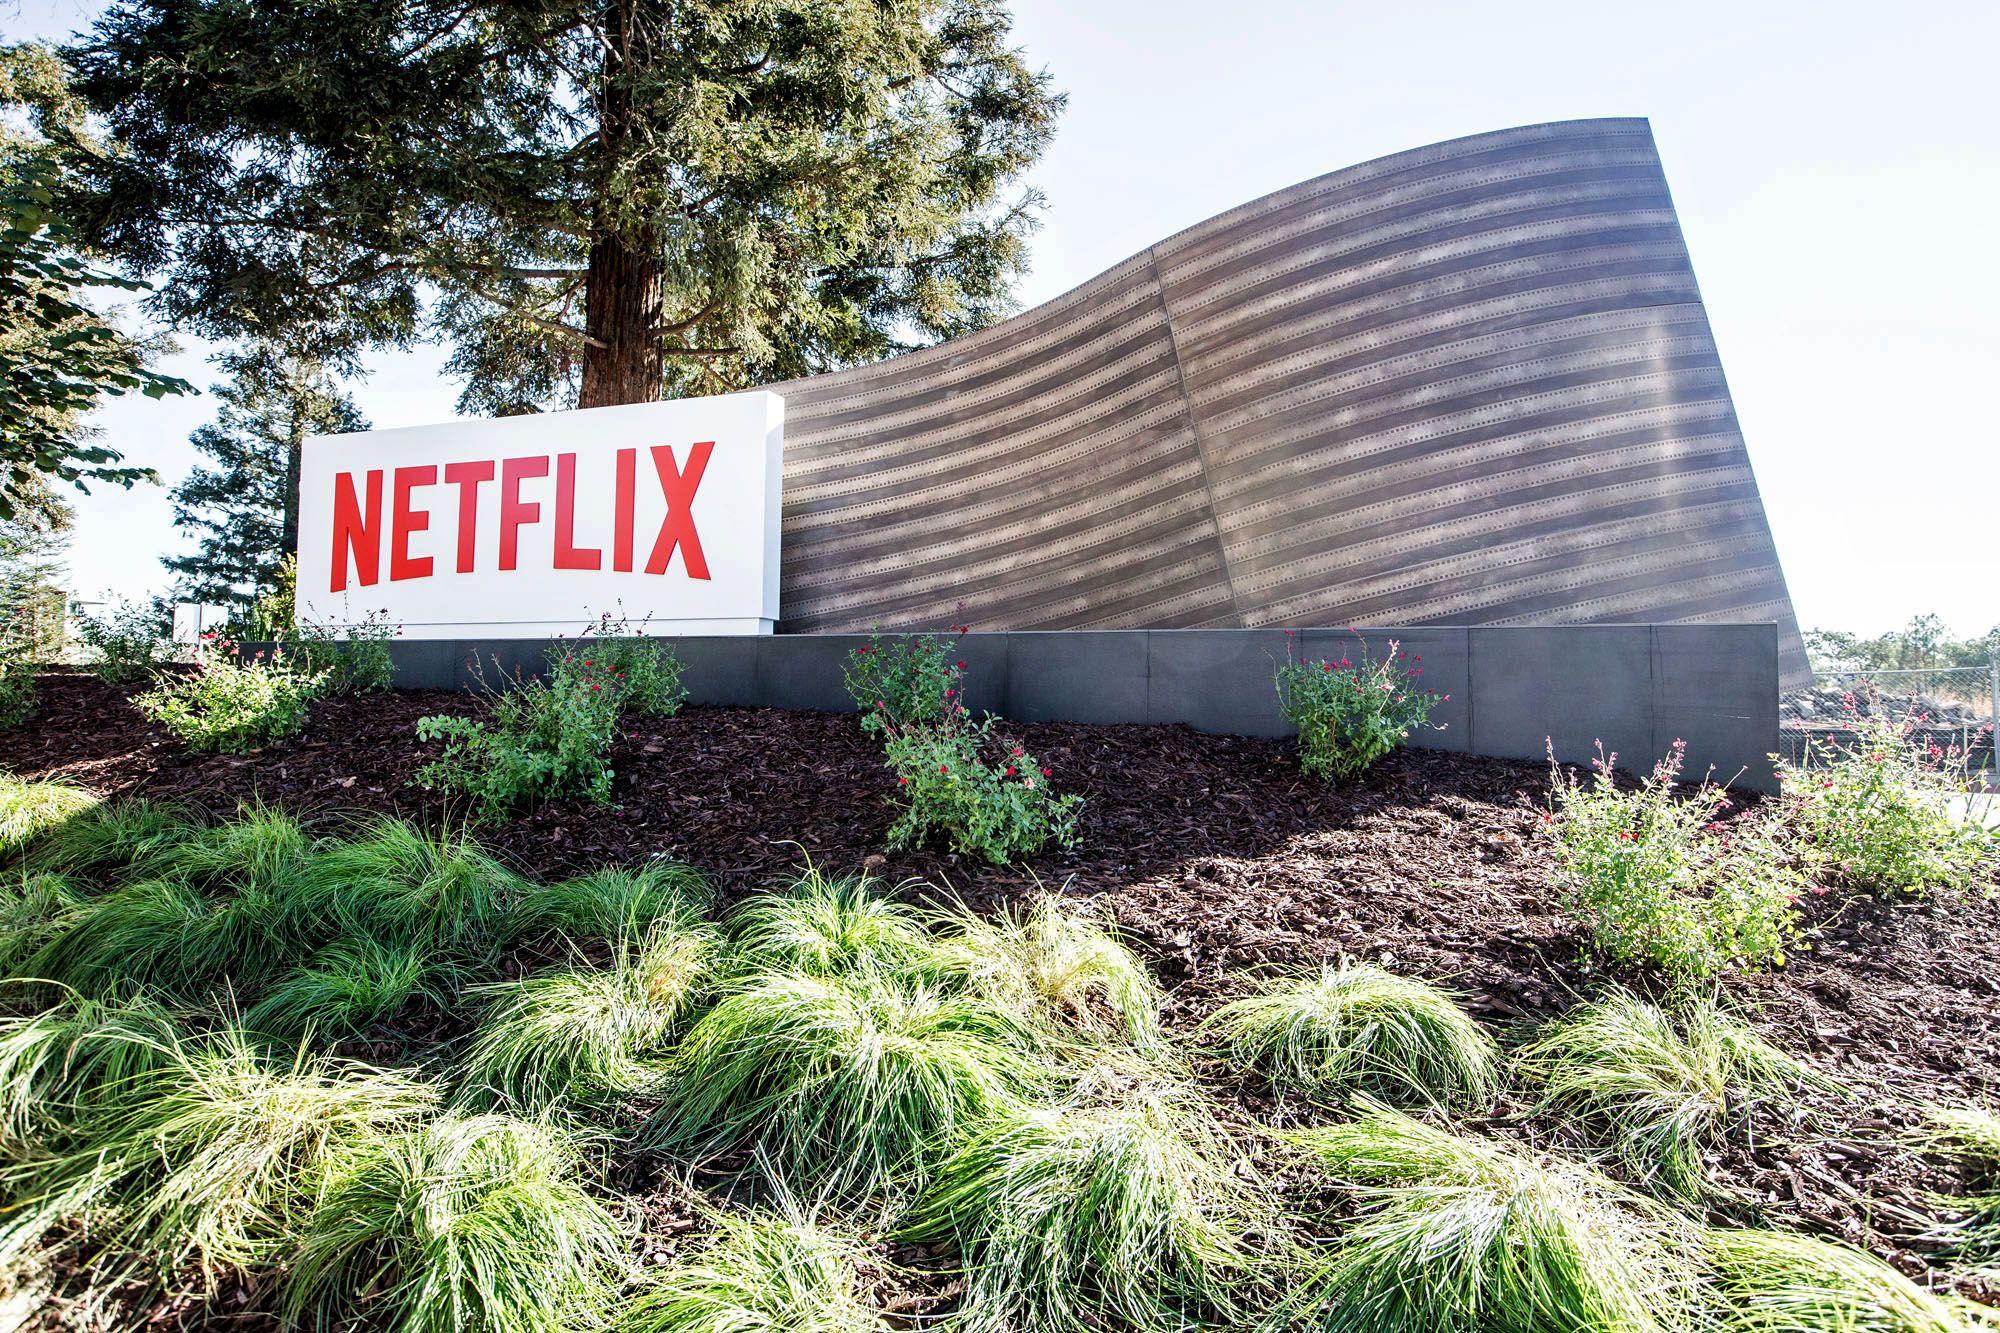 netflix, netflix revenue, netflix earnings, netflix subscribers